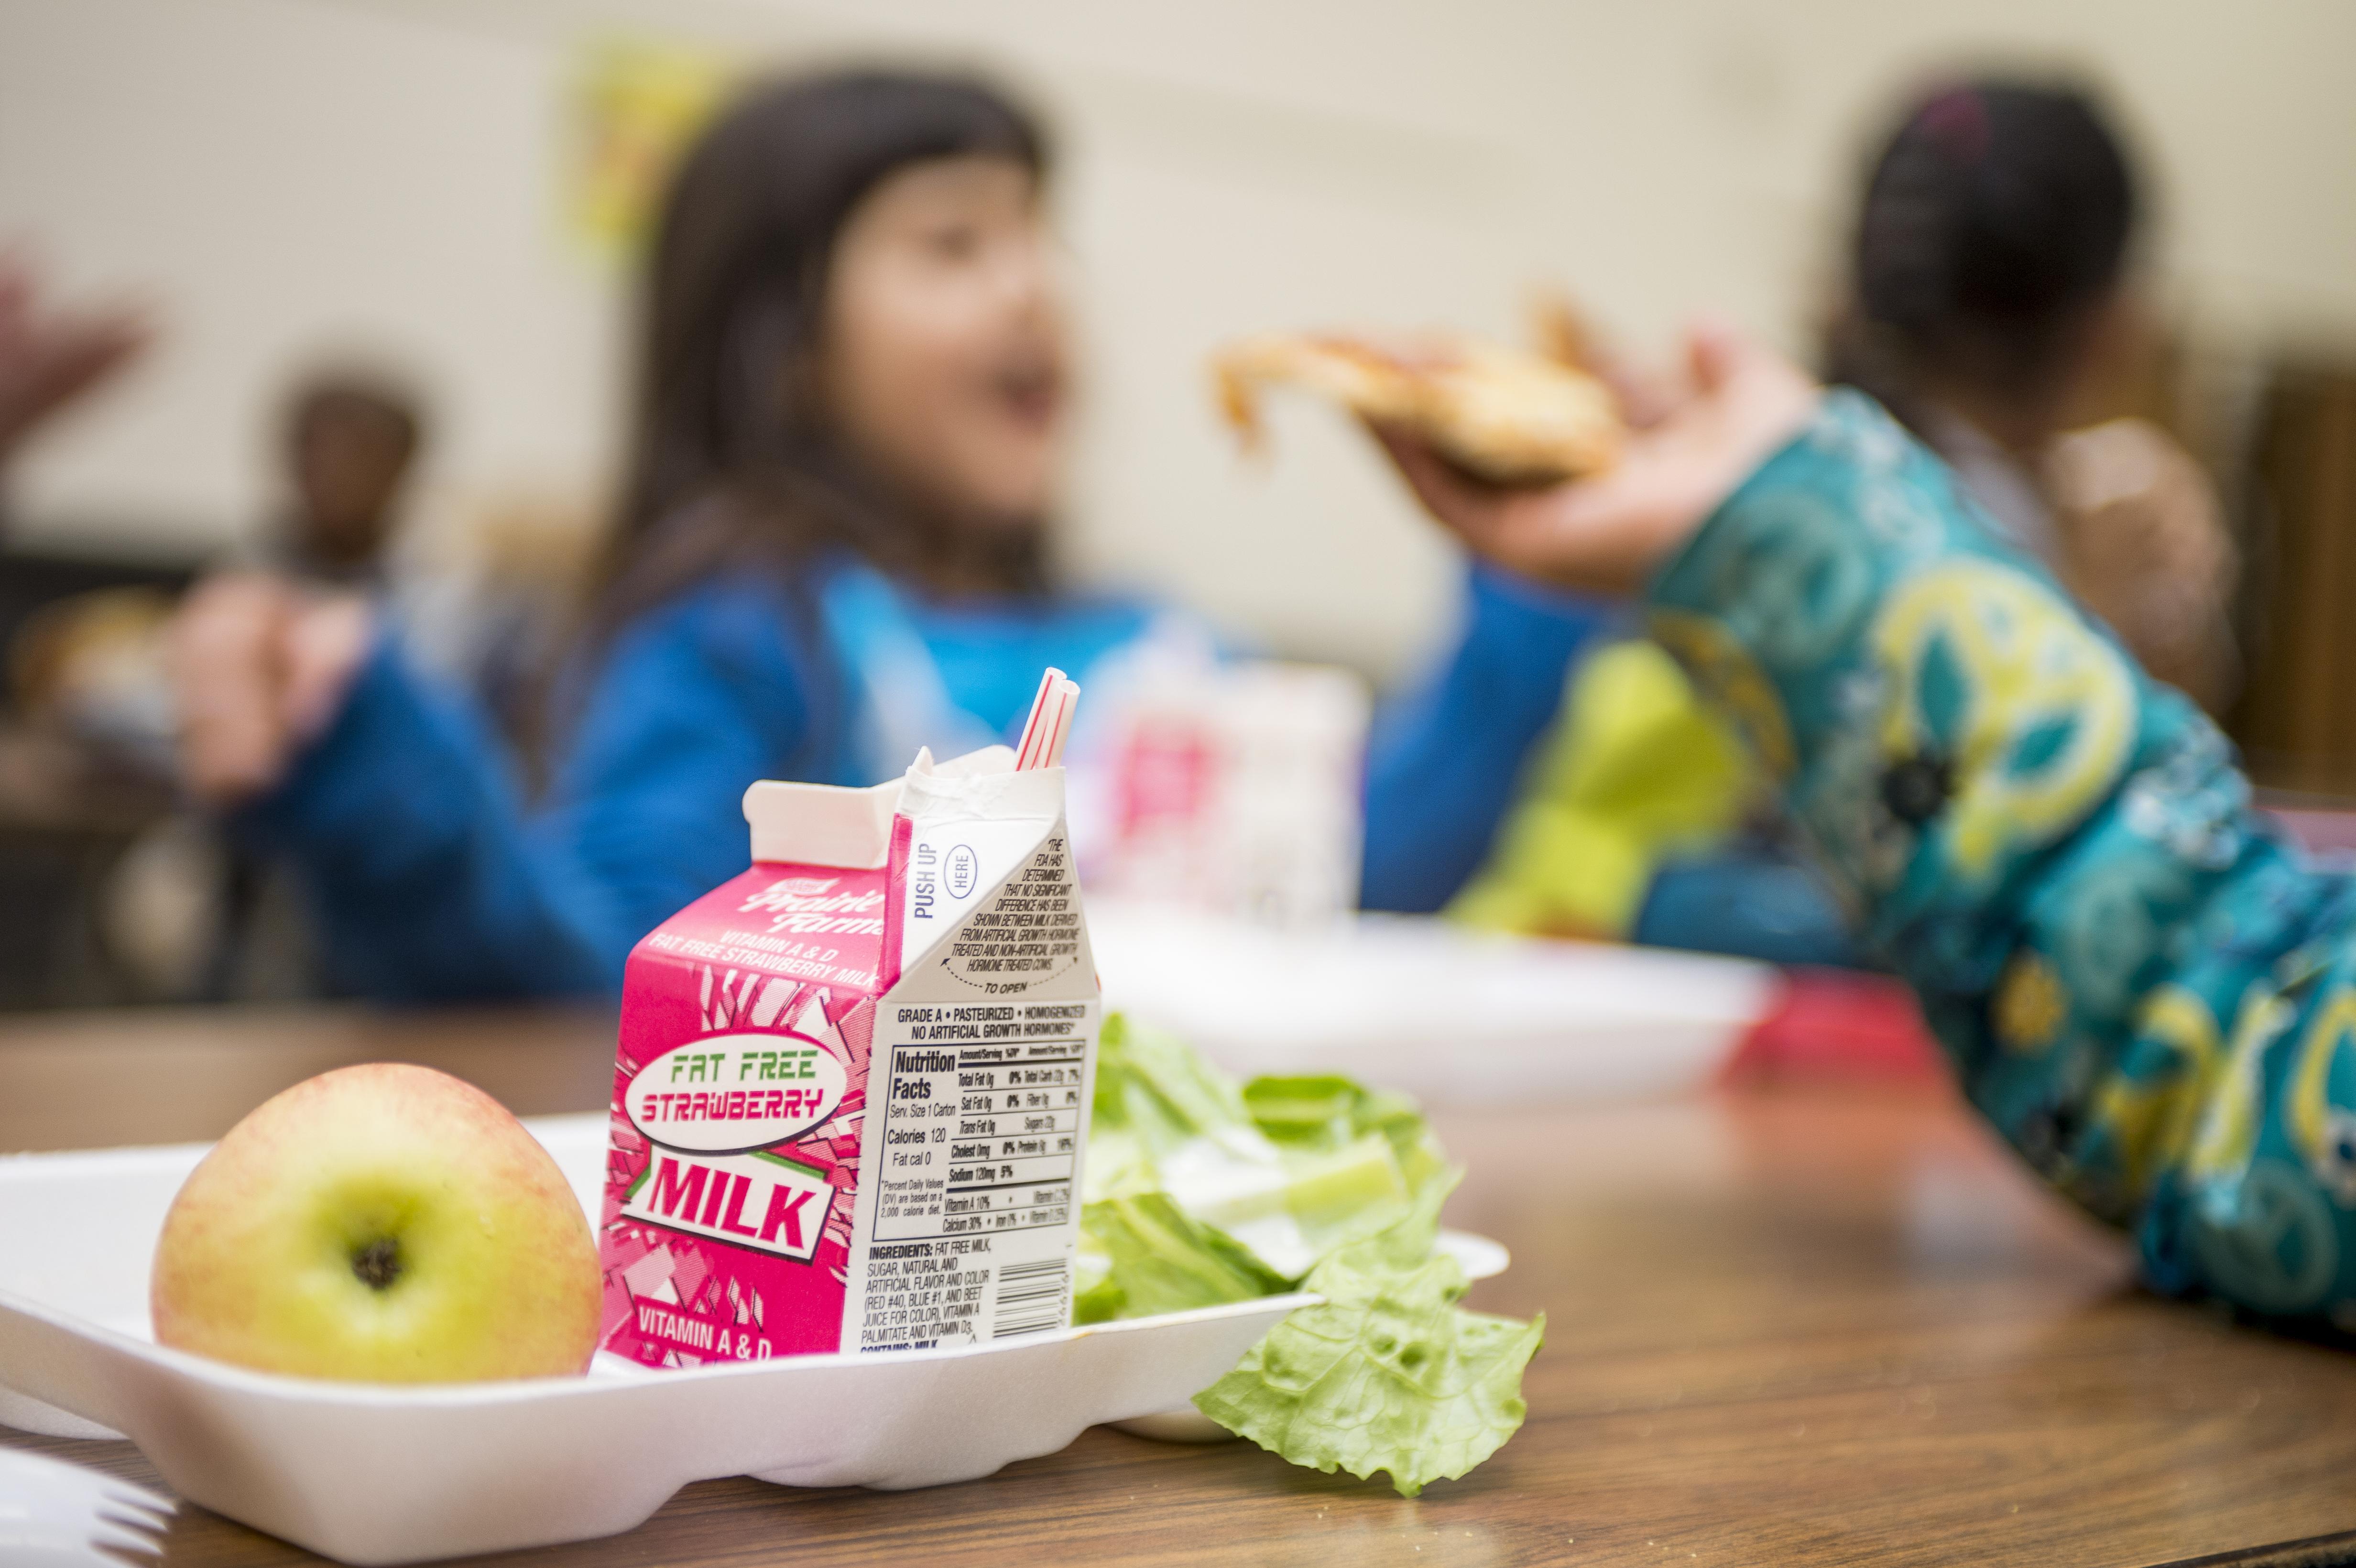 Arcadia Elementary School students eat lunch on Nov. 18, 2016 in Kalamazoo, Michigan.